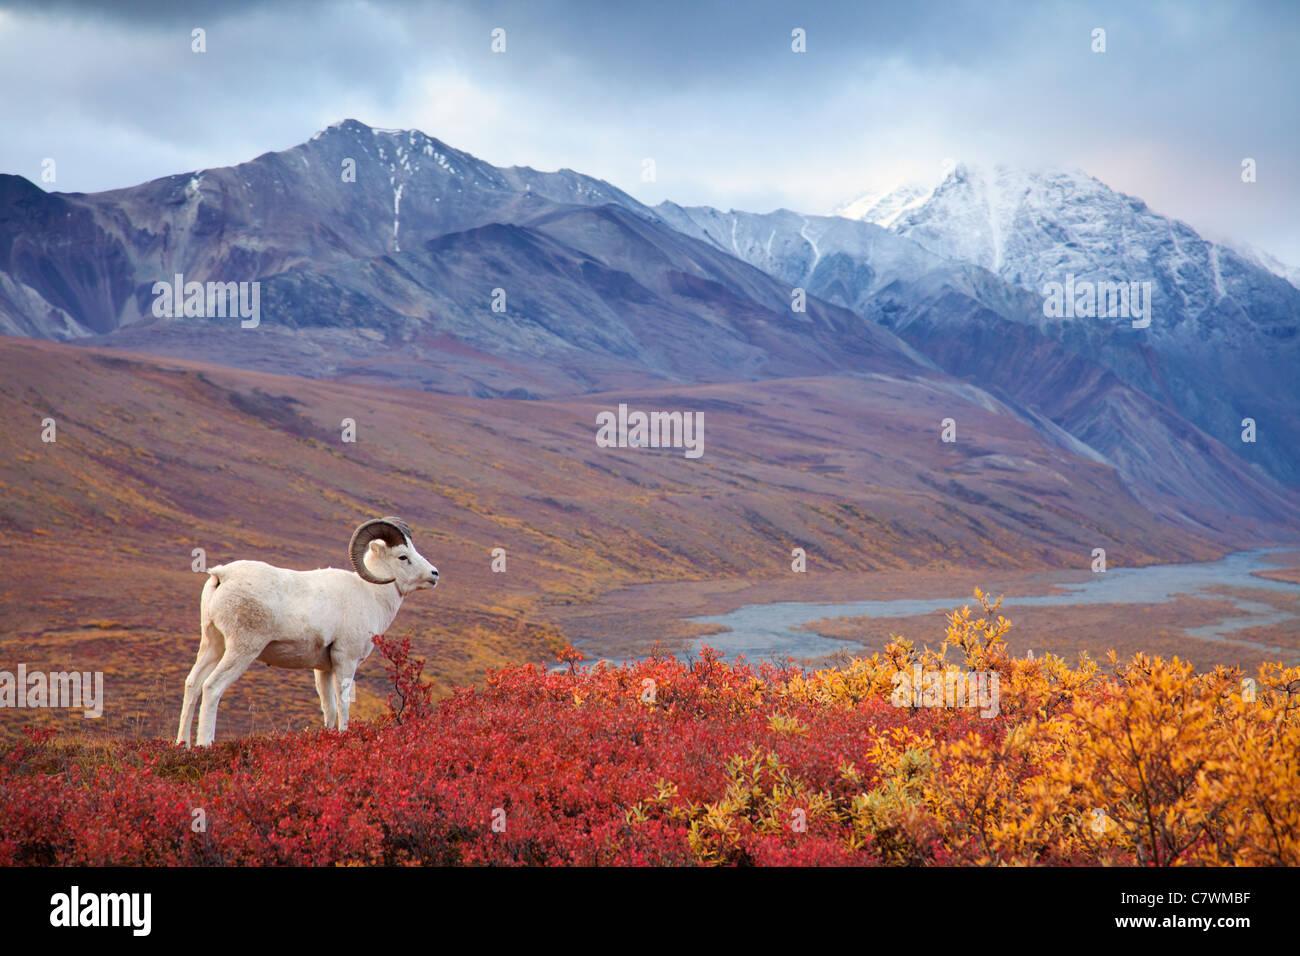 Dall's sheep in Polychrome Pass, Denali National Park, Alaska. - Stock Image